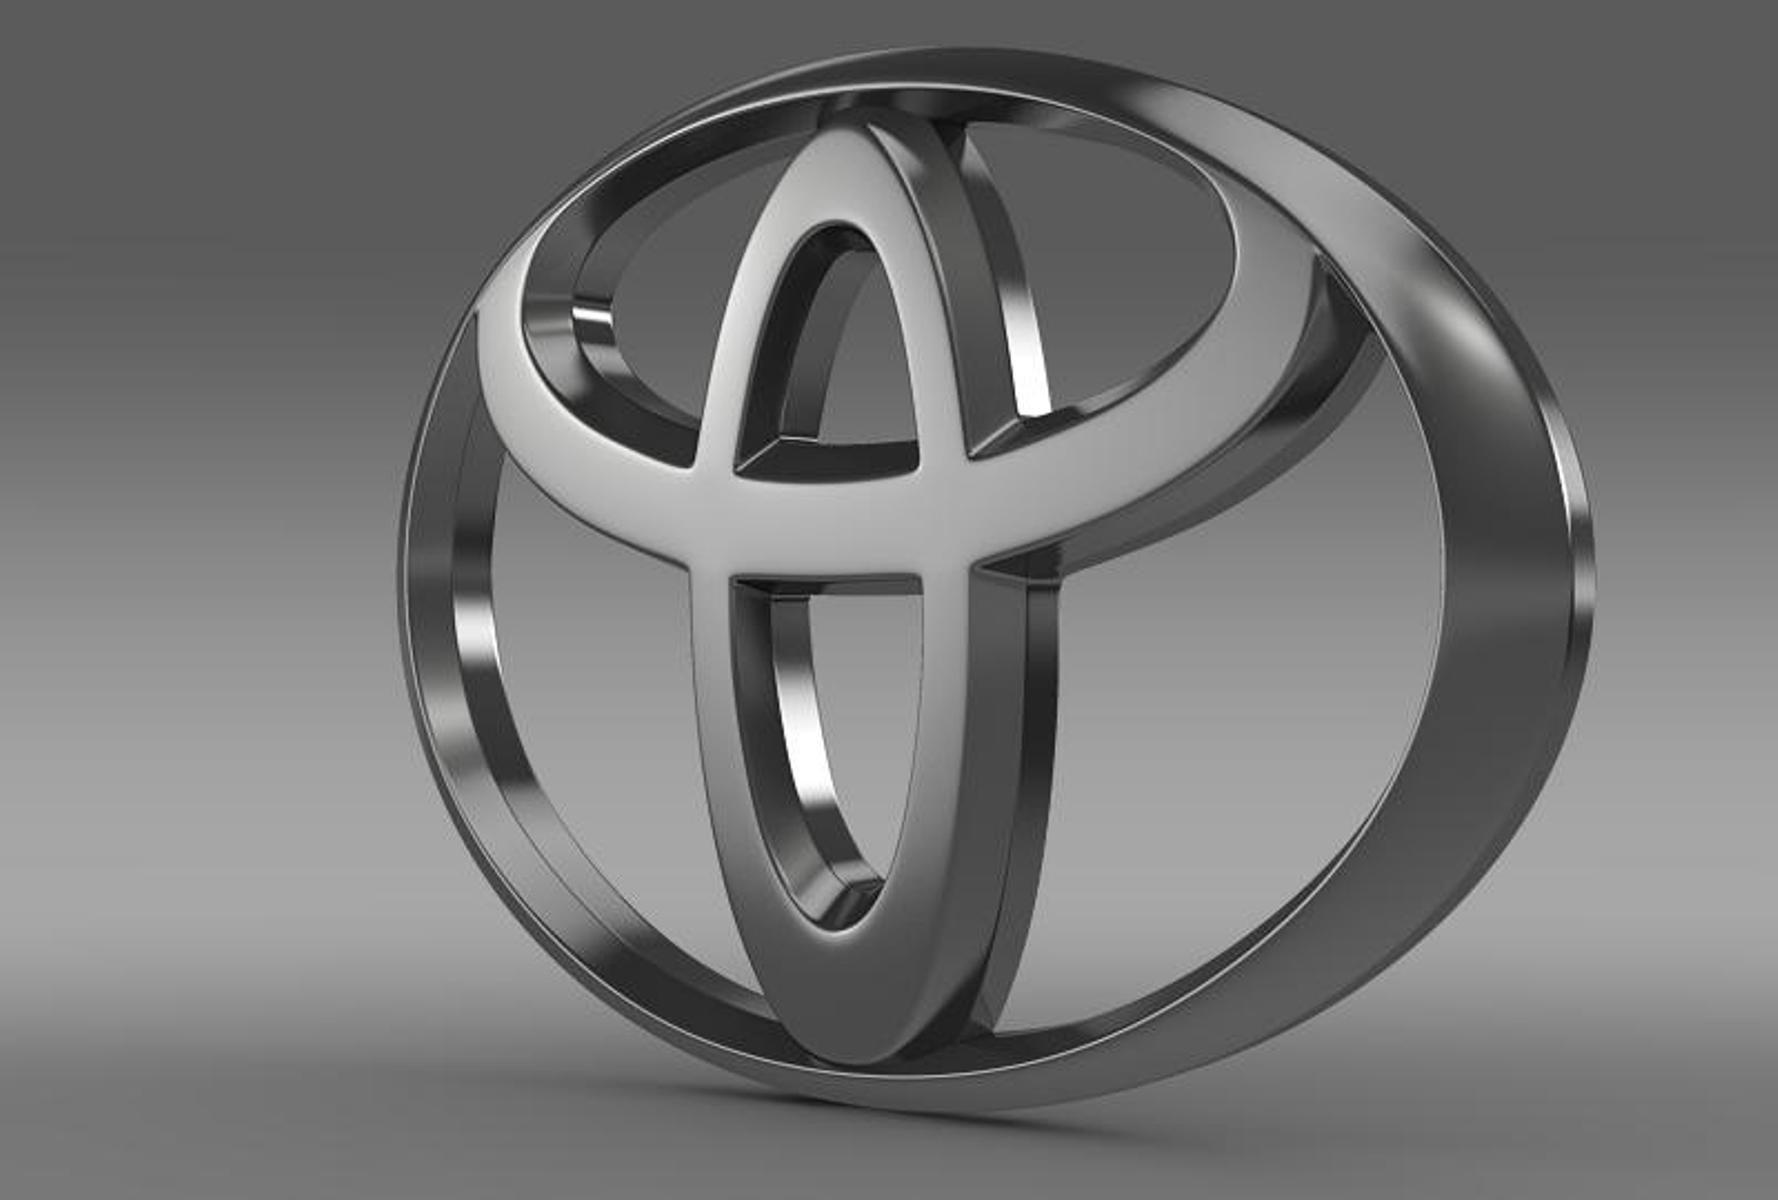 Toyota Wallpaper 3d Logo Logo Wallpapers Hd Toyota Logo Logo Wallpaper Hd Toyota